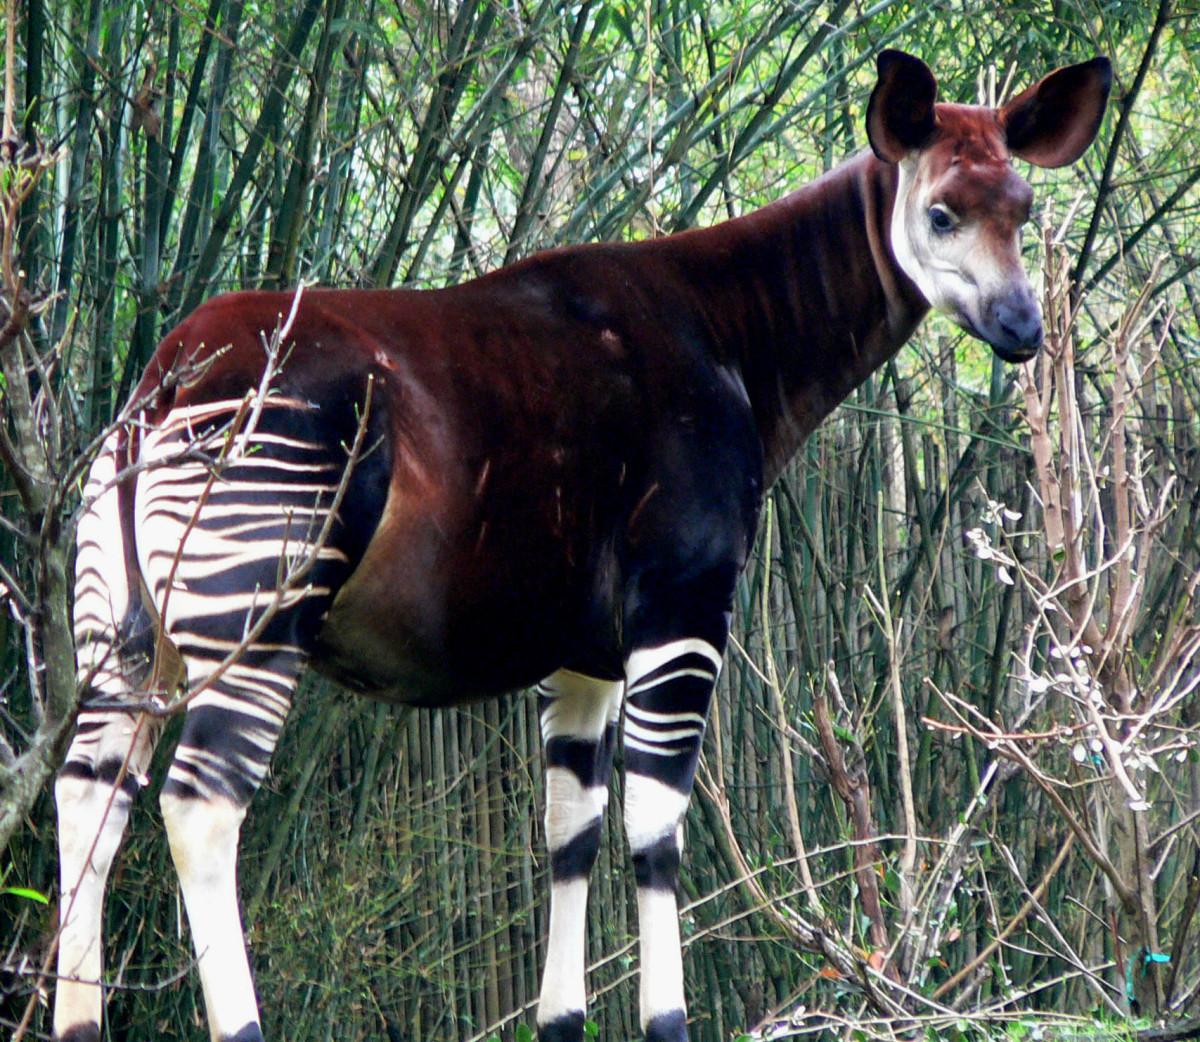 An Okapi. Taken at Disney's Animal Kingdom by Raul654 on January 16, 2005